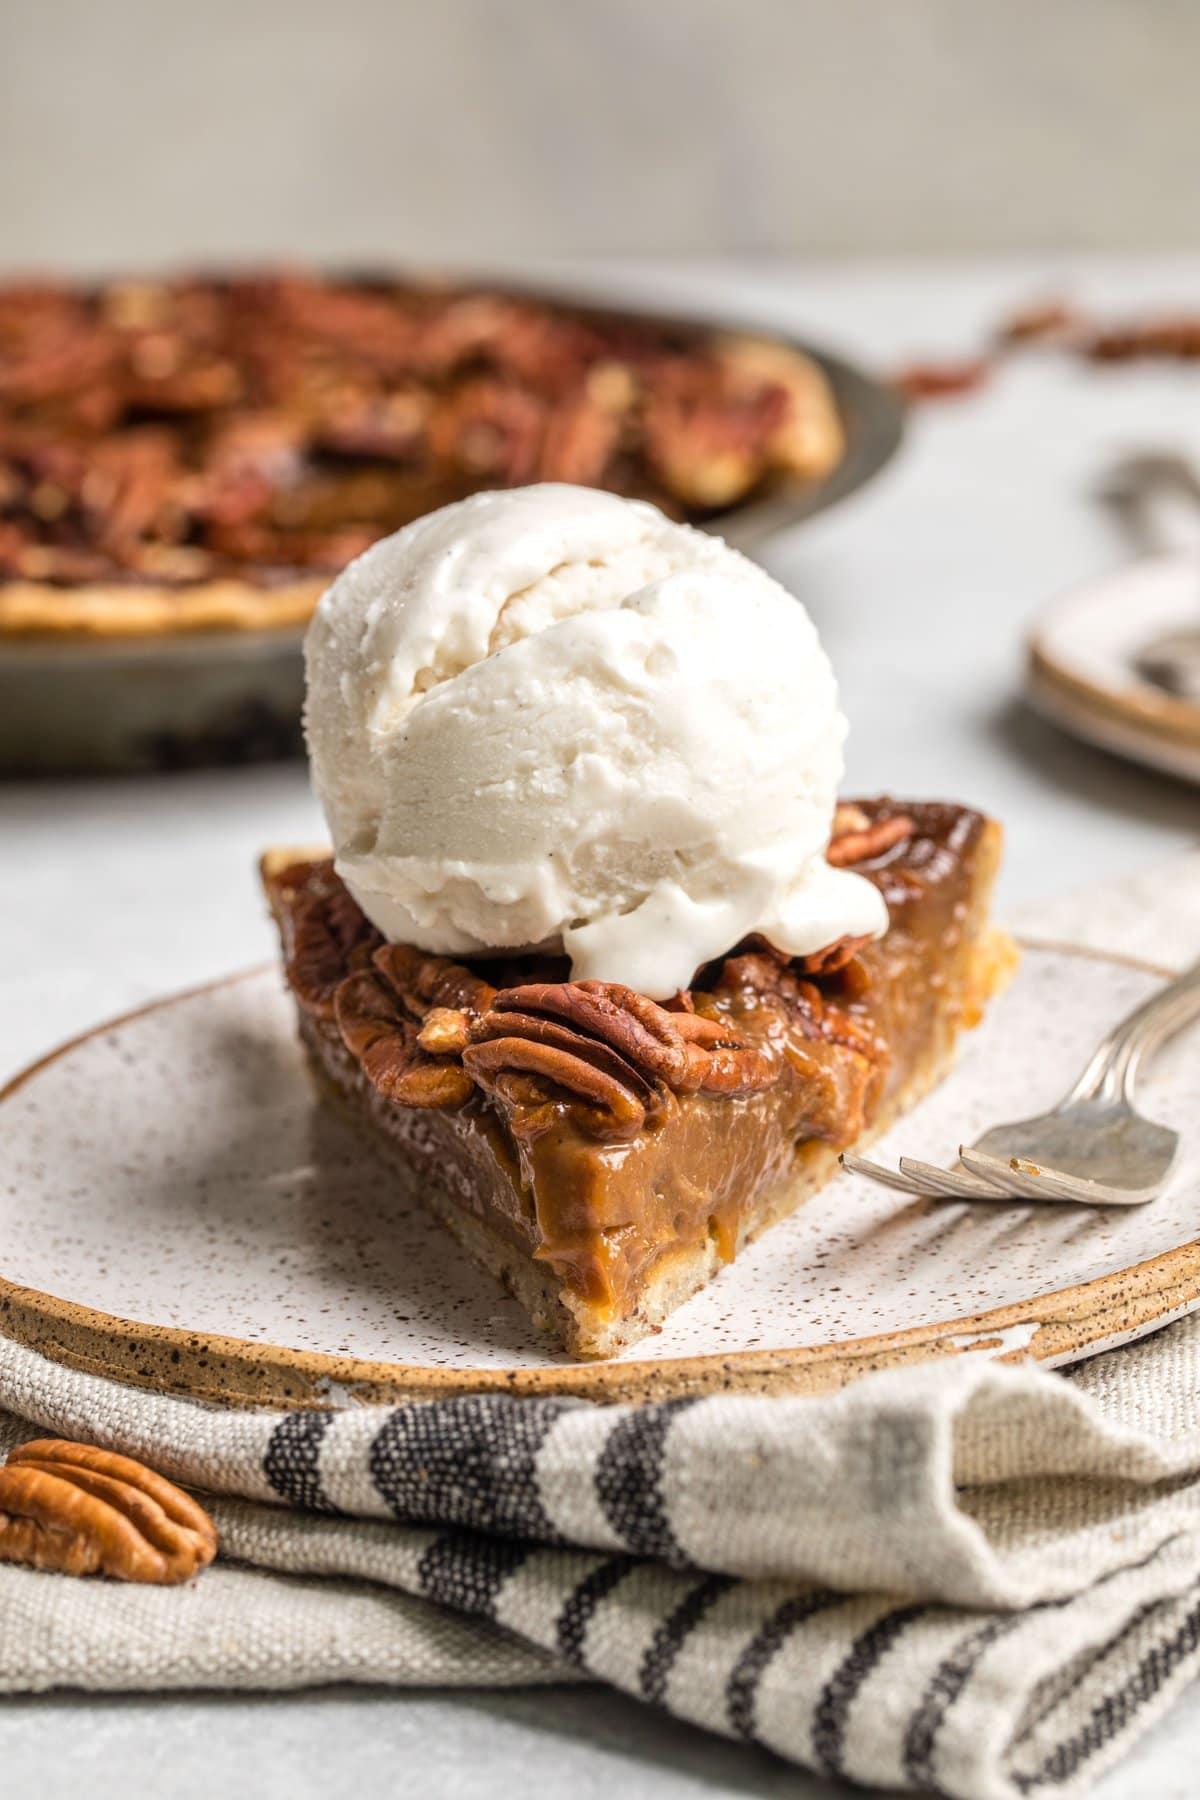 vegan pecan pie topped with vanilla ice cream scoop on white plate